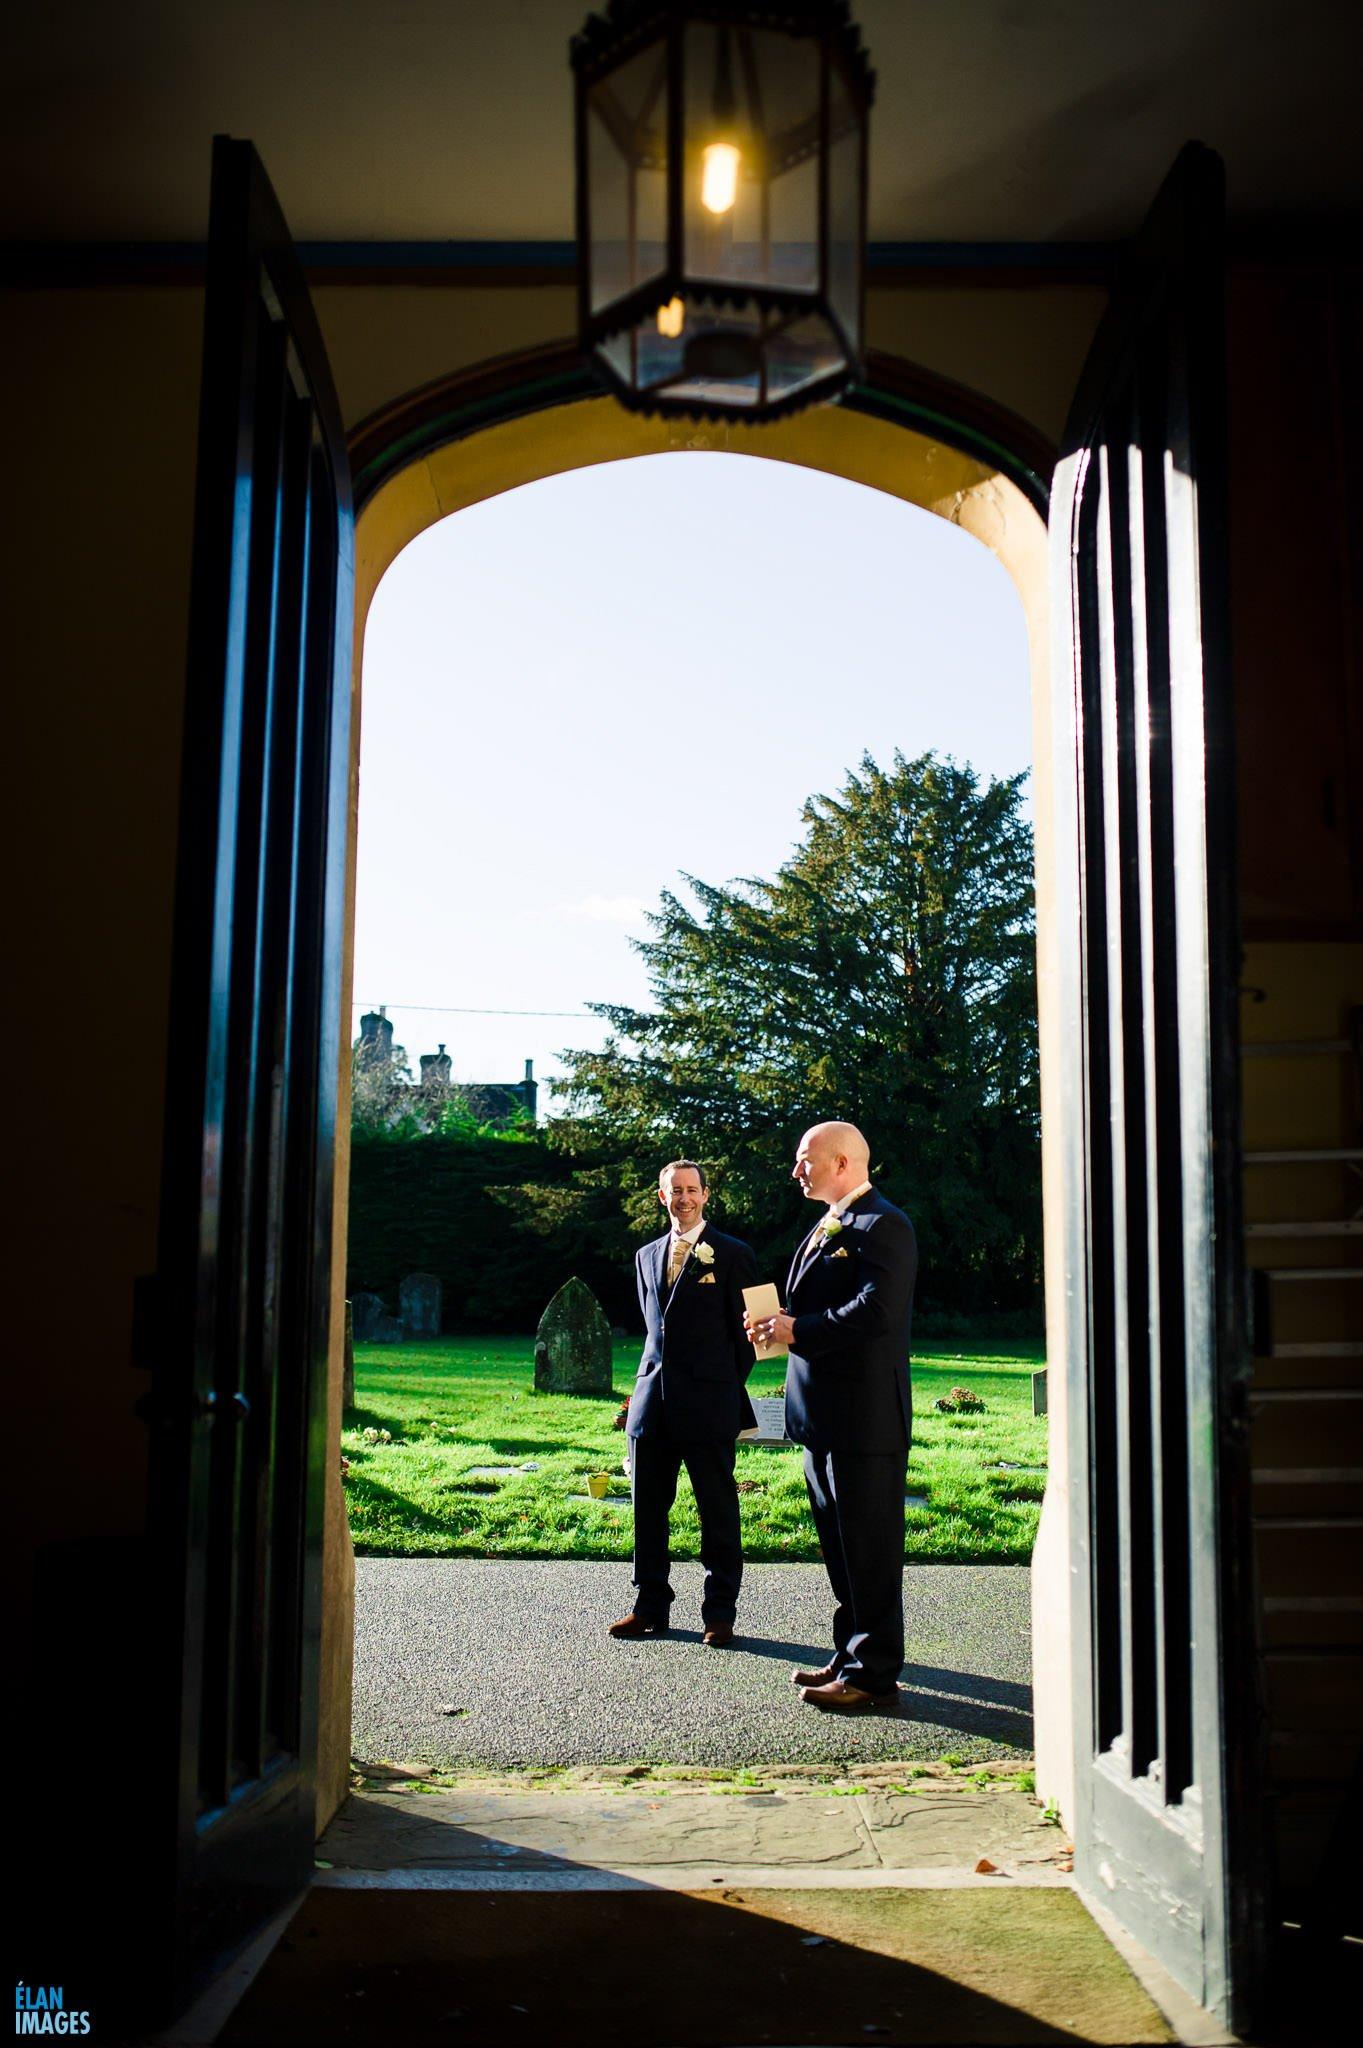 Wedding at leigh park hotel -033